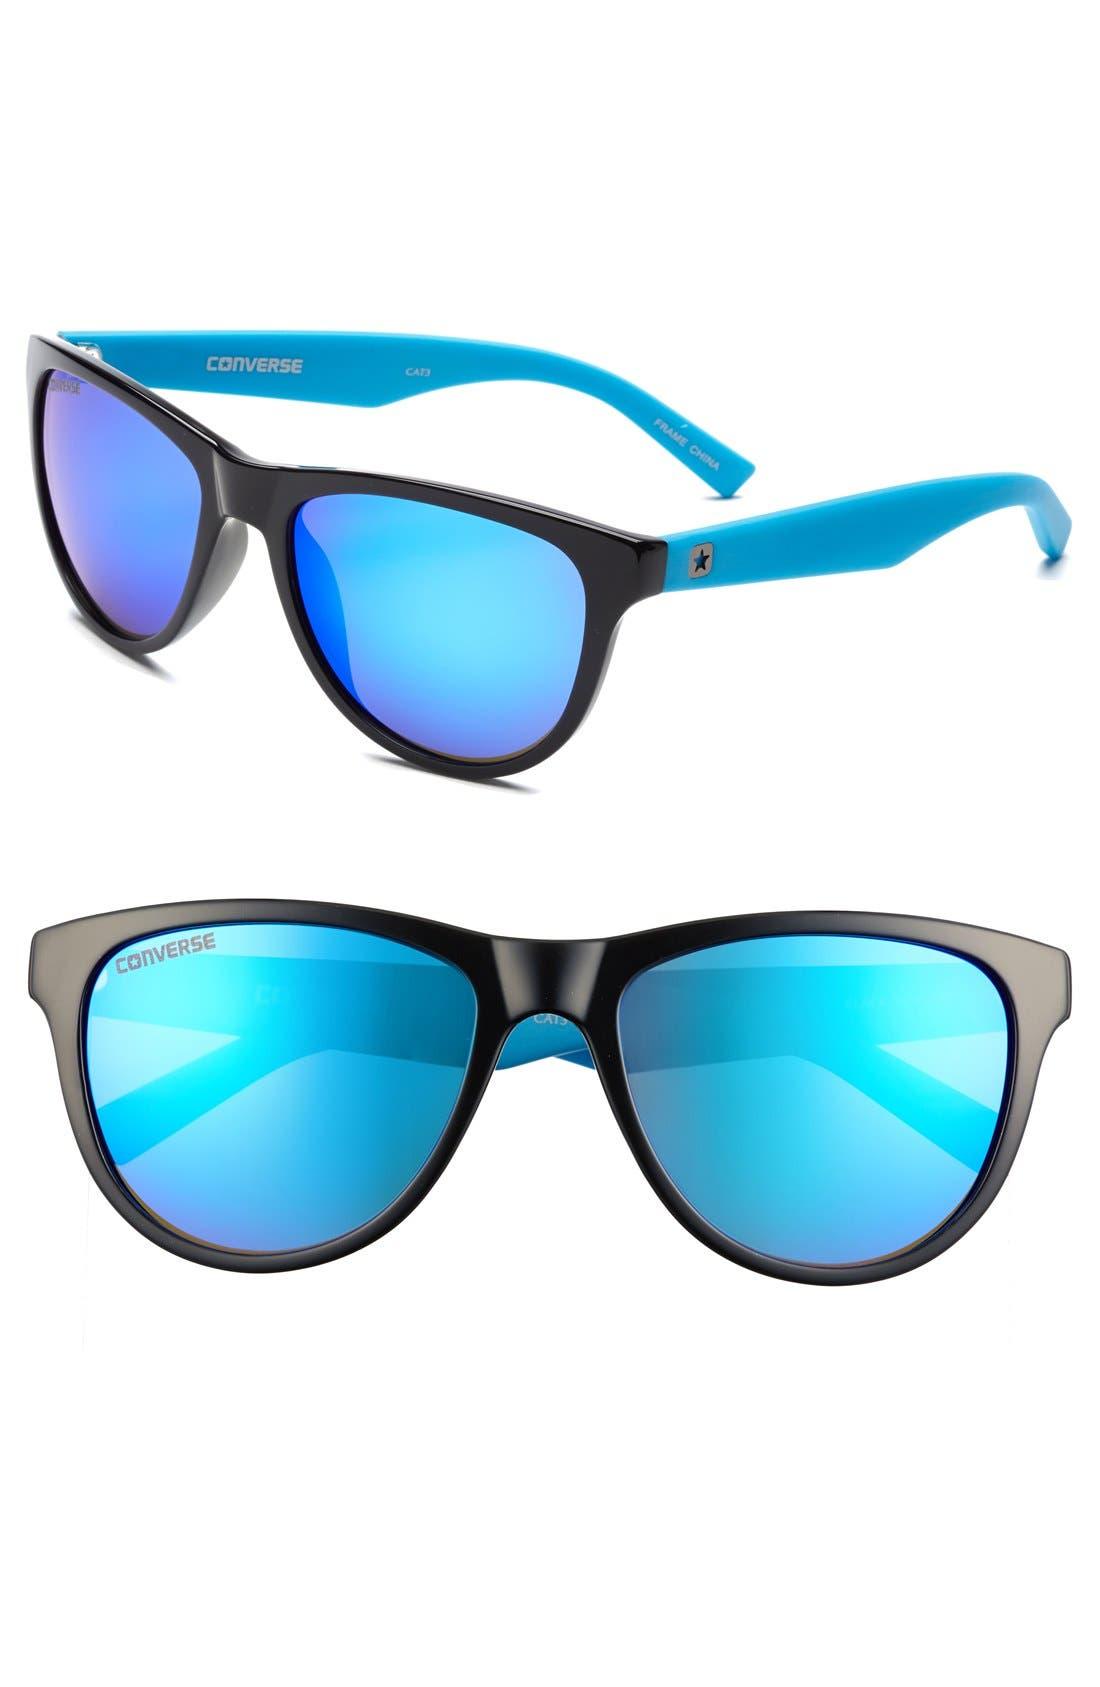 Main Image - Converse 'Master Track' 56mm Sunglasses